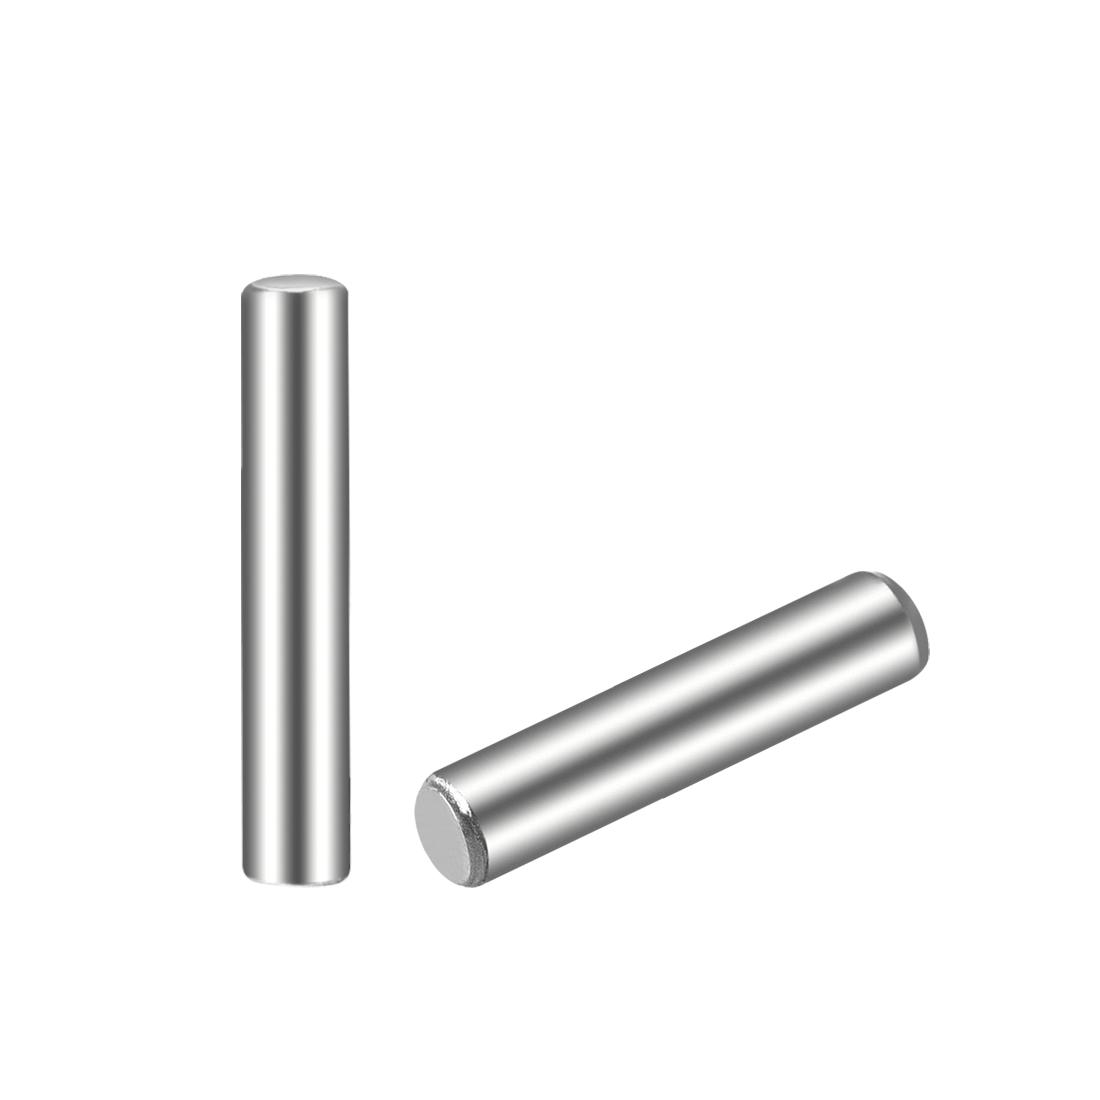 50Pcs 2.5mm x 14mm Dowel Pin 304 Stainless Steel Shelf Support Pin Fasten